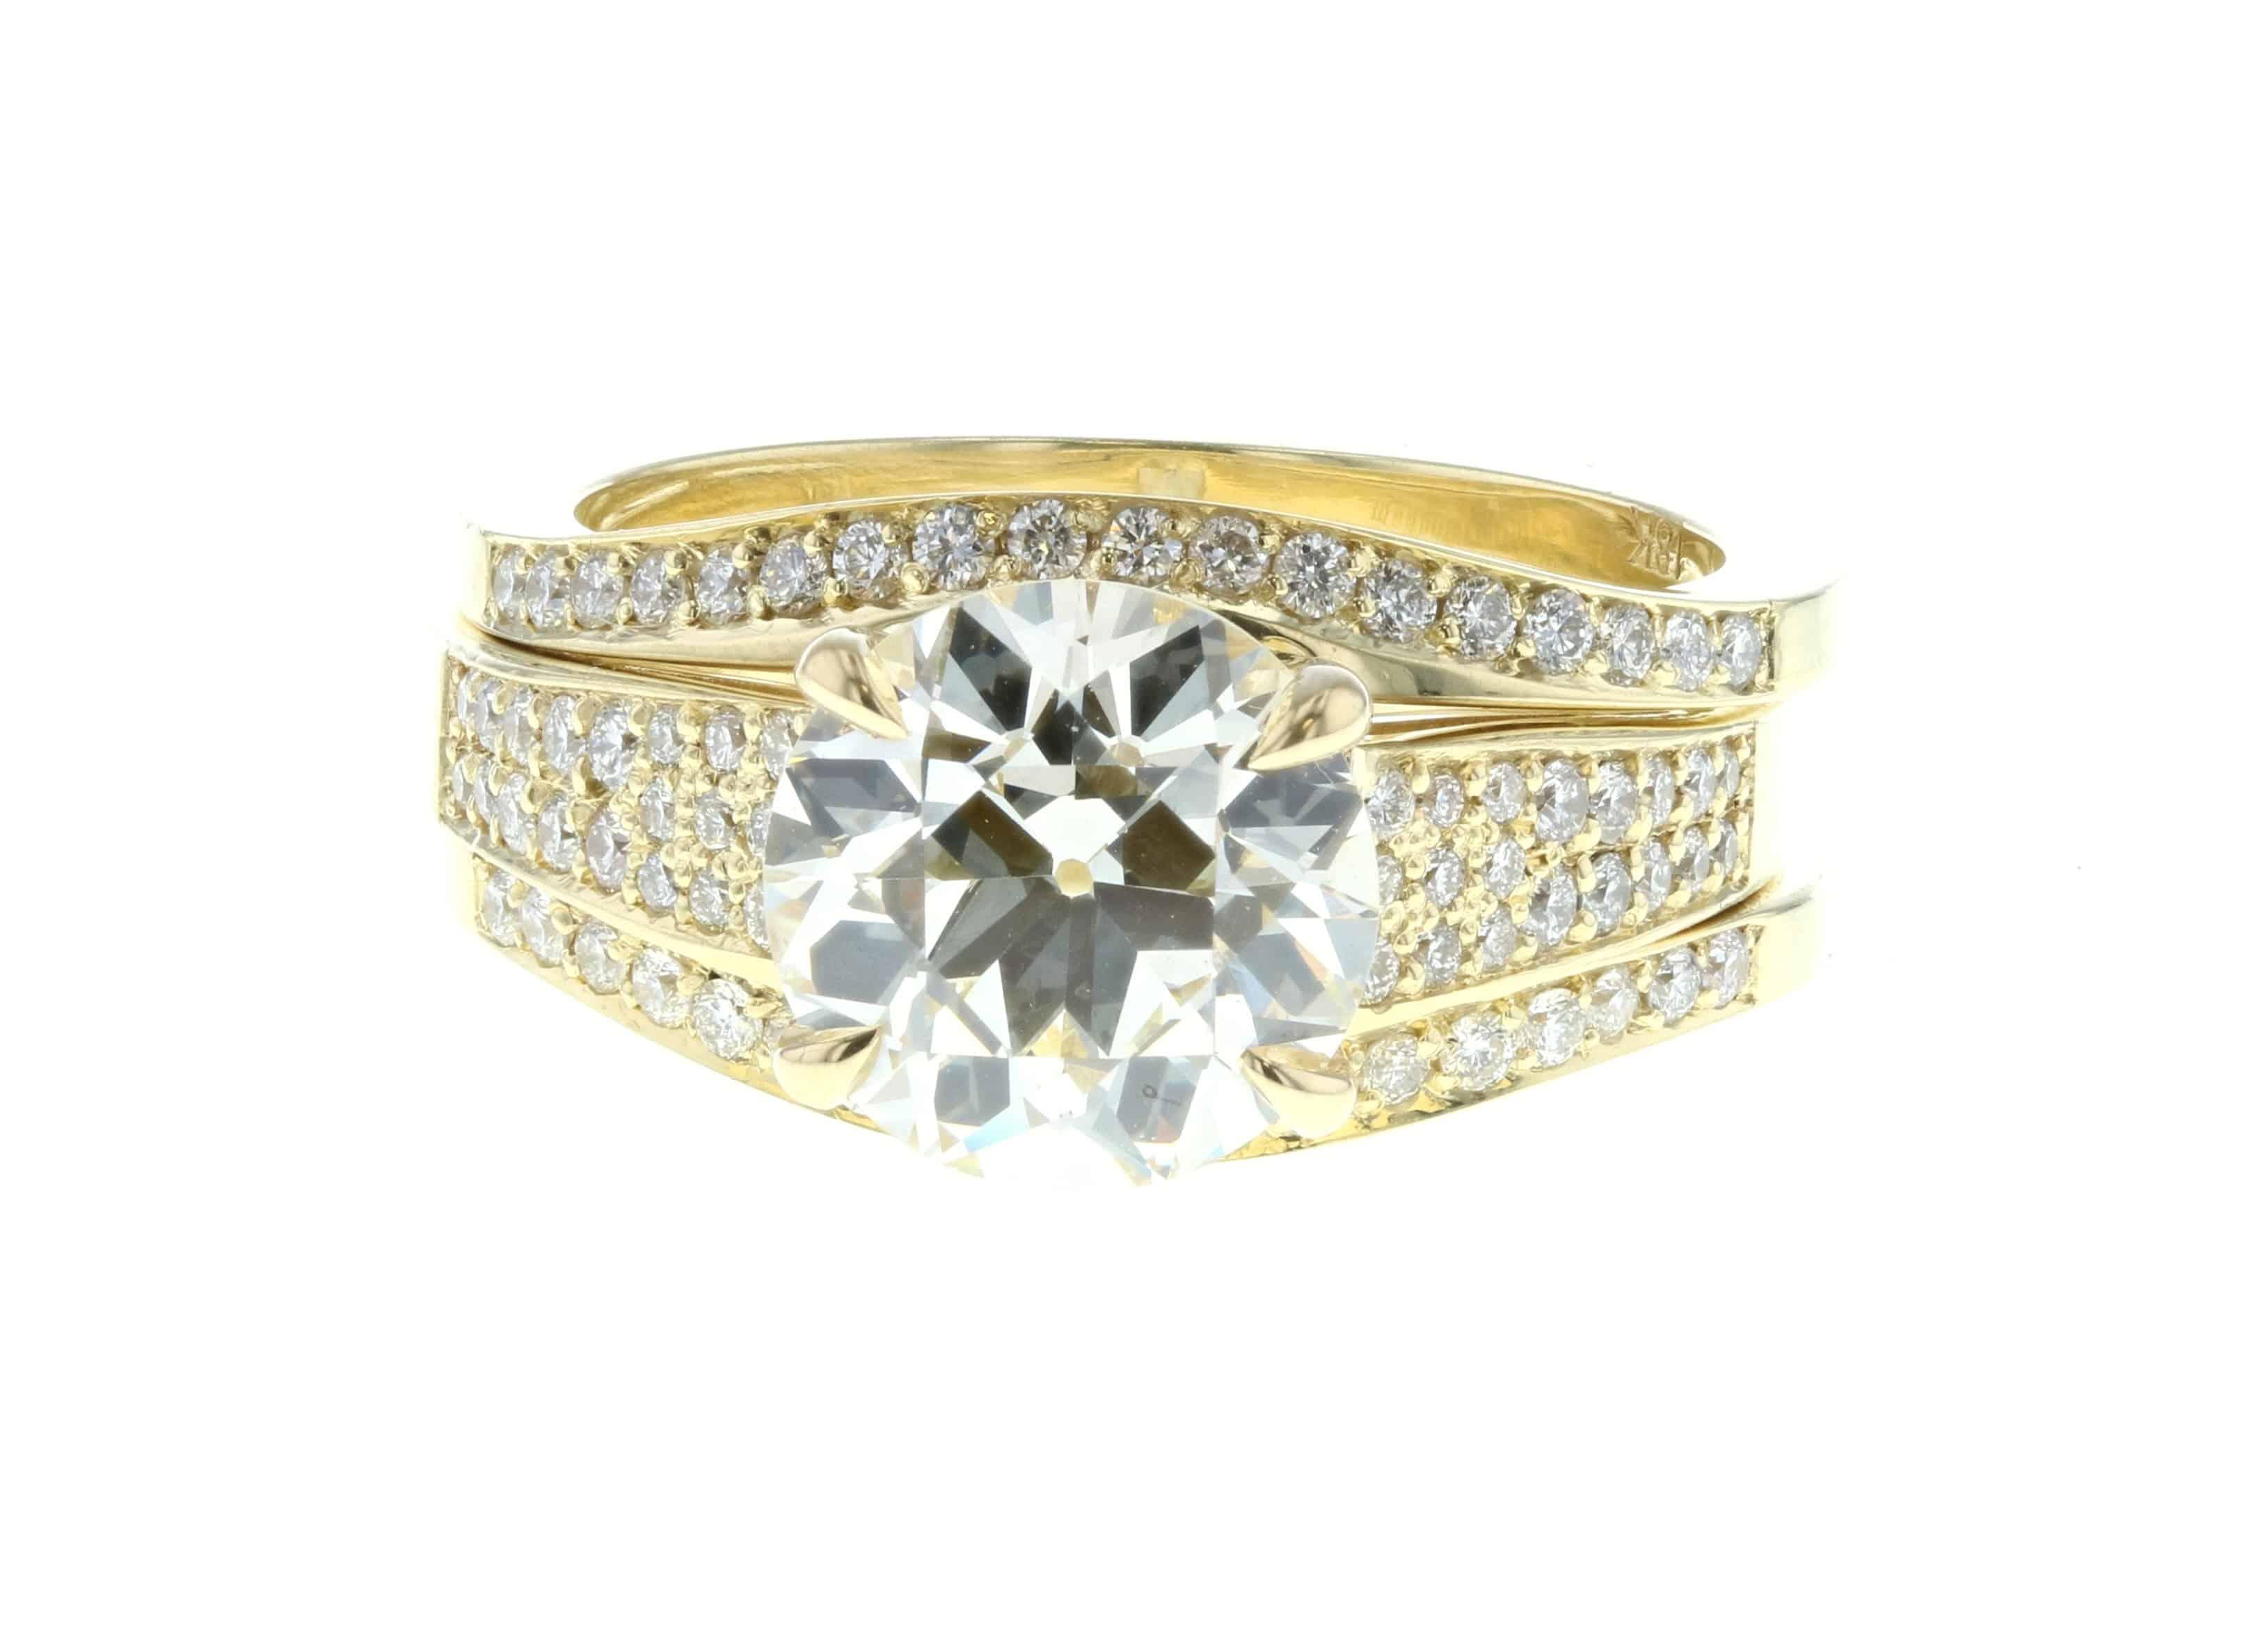 Large Diamond Engagement Ring – Concierge Diamonds Los Angeles Regarding 2018 Micropavé Diamond Large Wedding Bands (View 15 of 25)